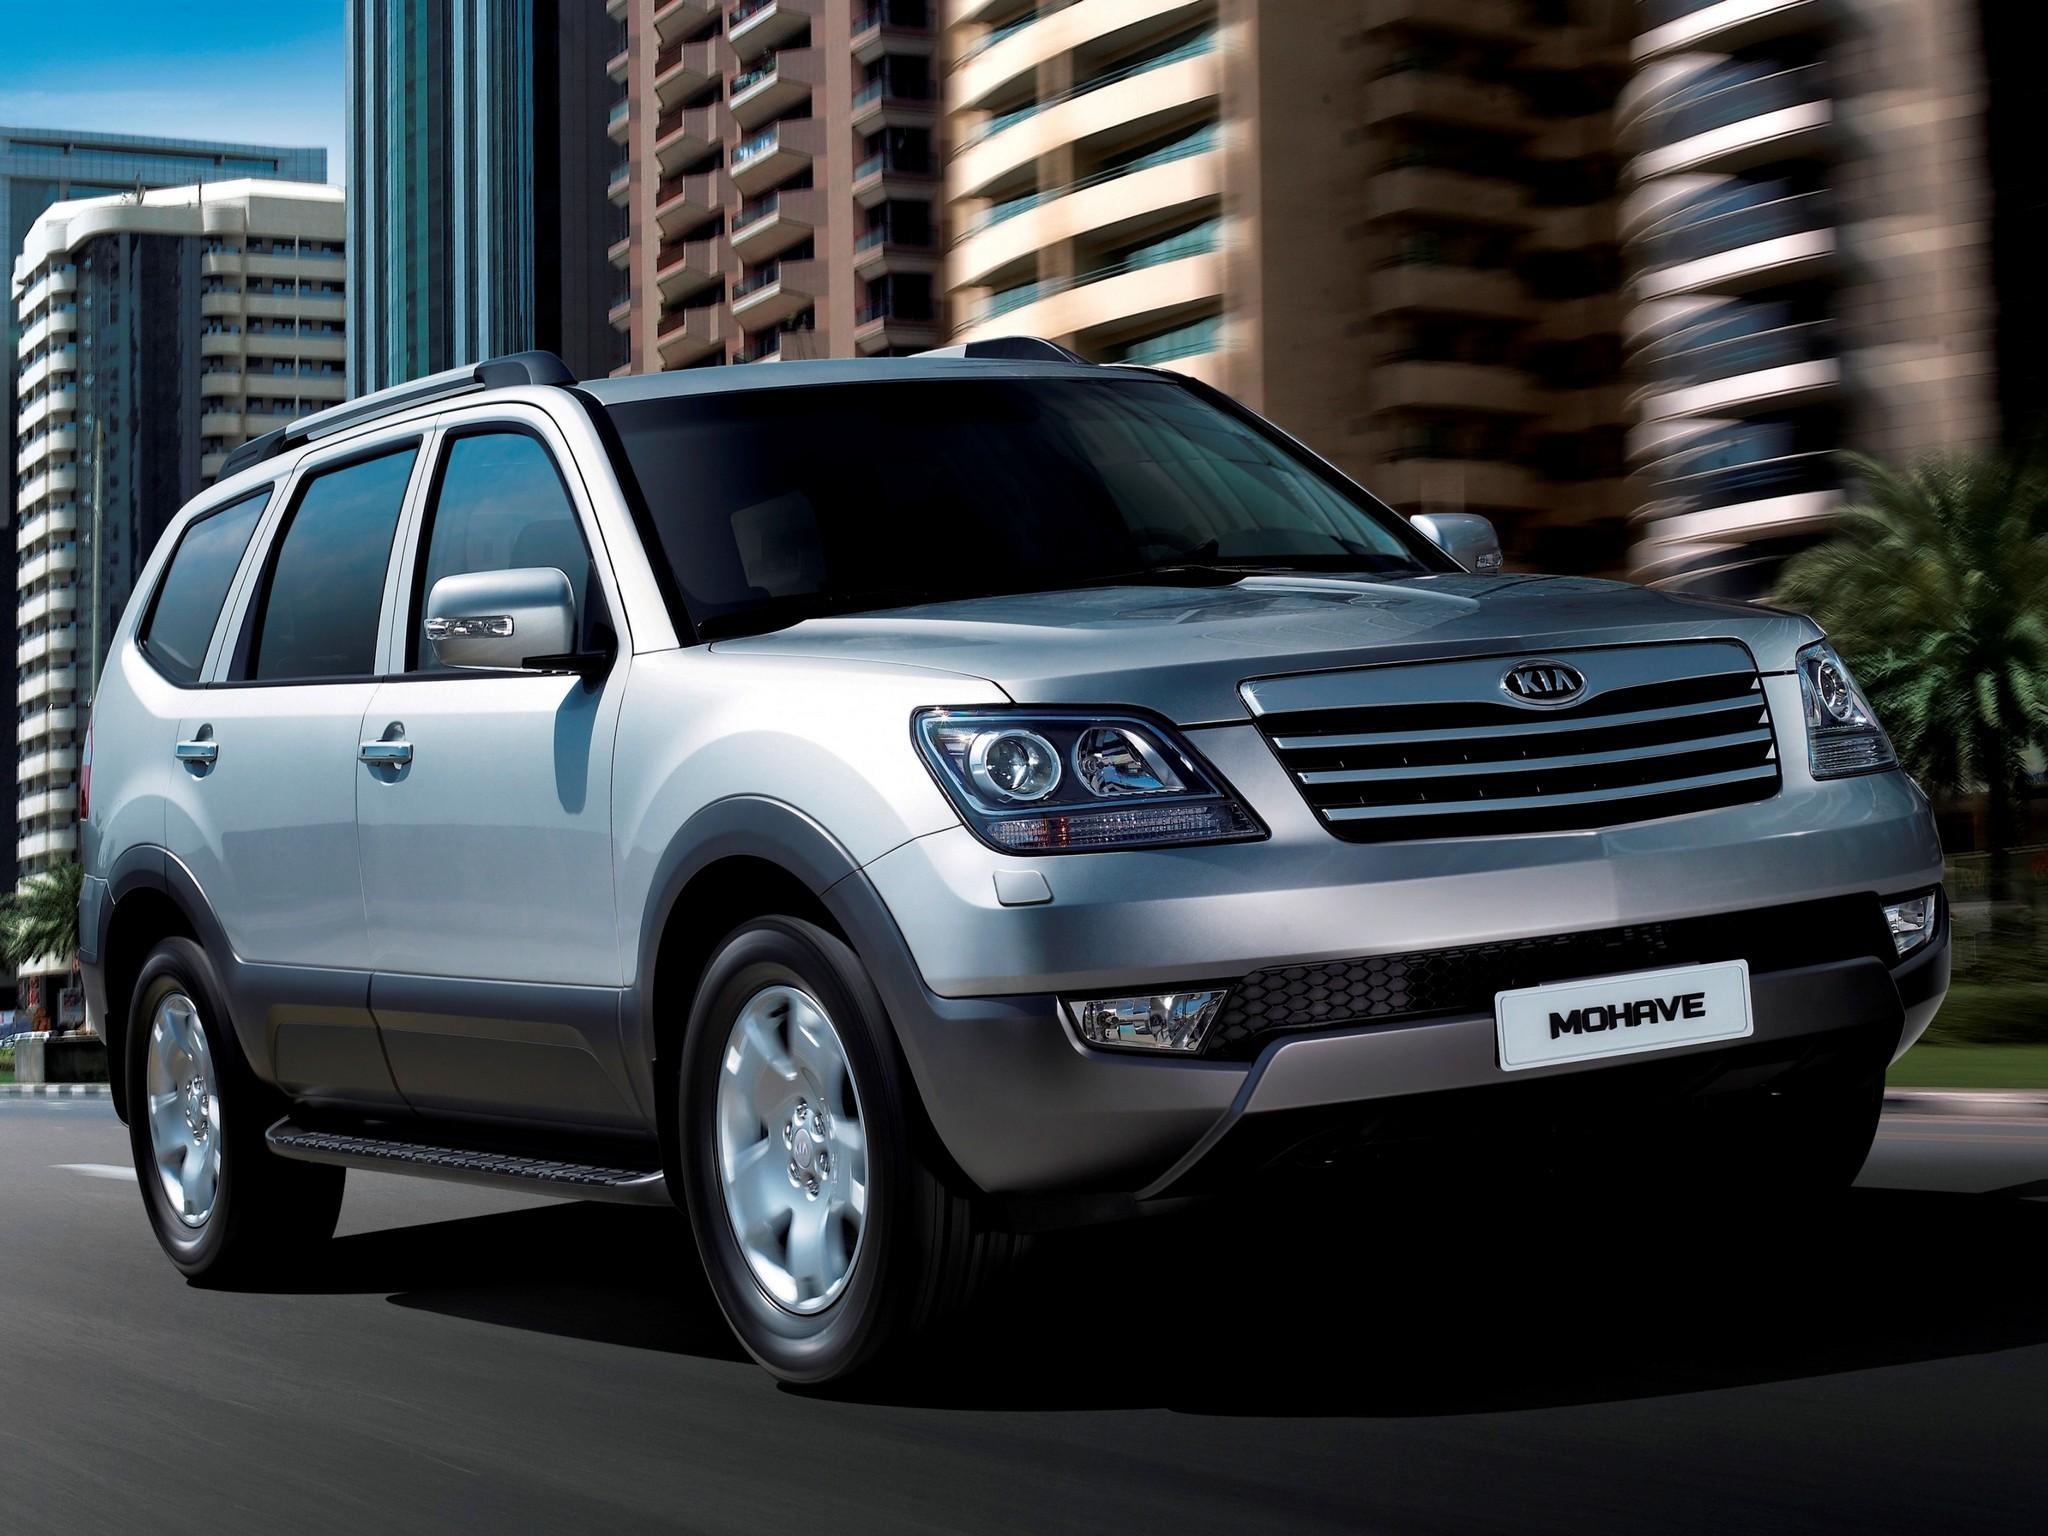 Kia Motors представила рестайлинговый внедорожник Mohave